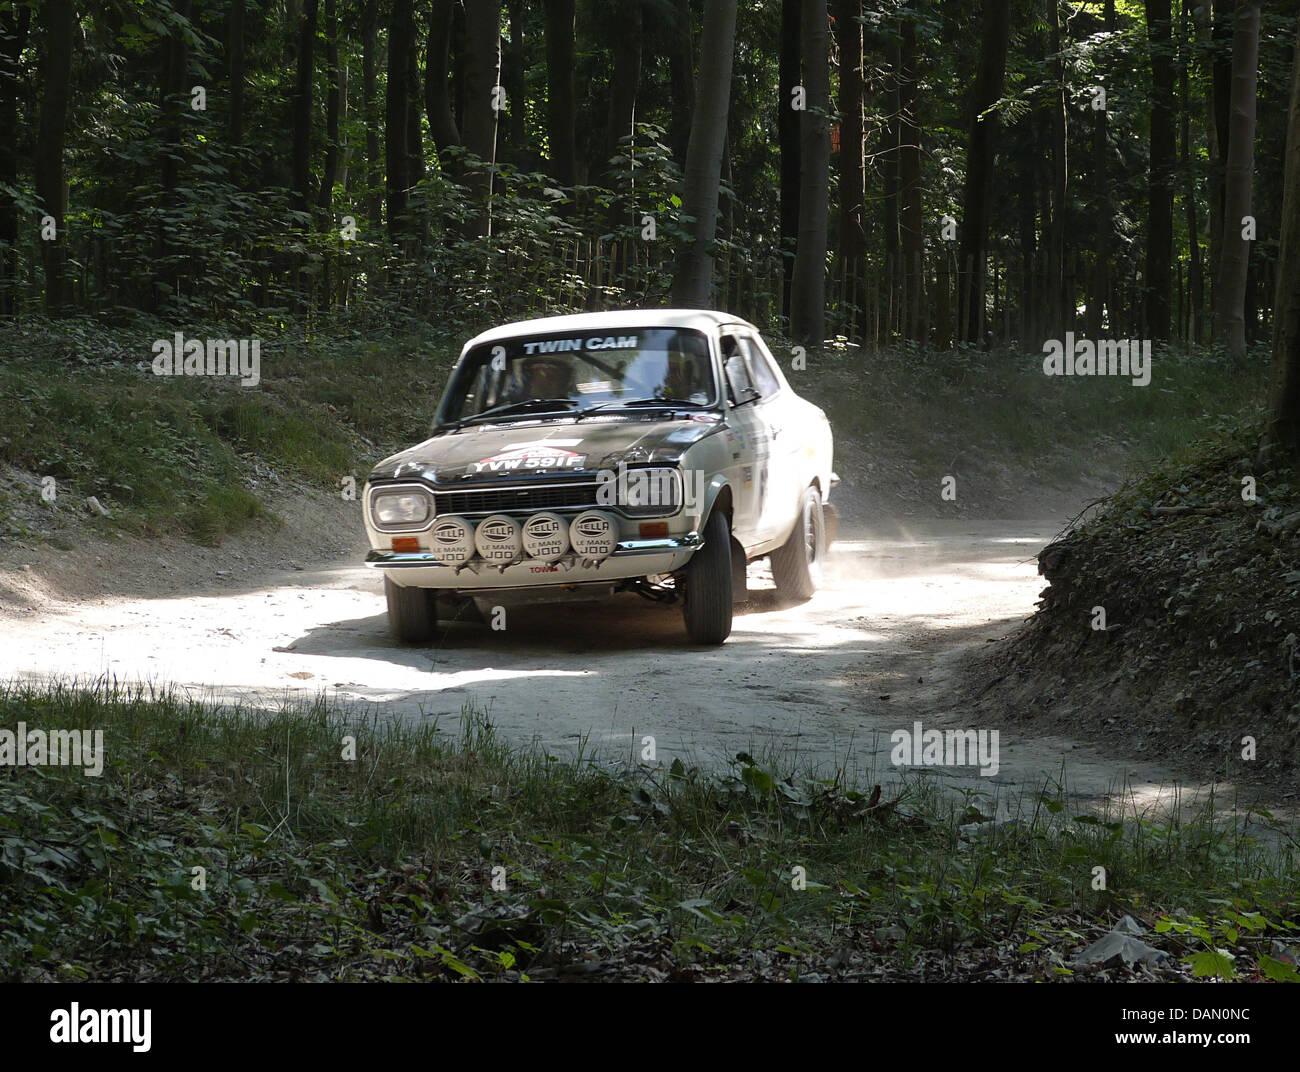 Ford Escort Mk1 rally festival de velocidad de Goodwood 2013 Imagen De Stock